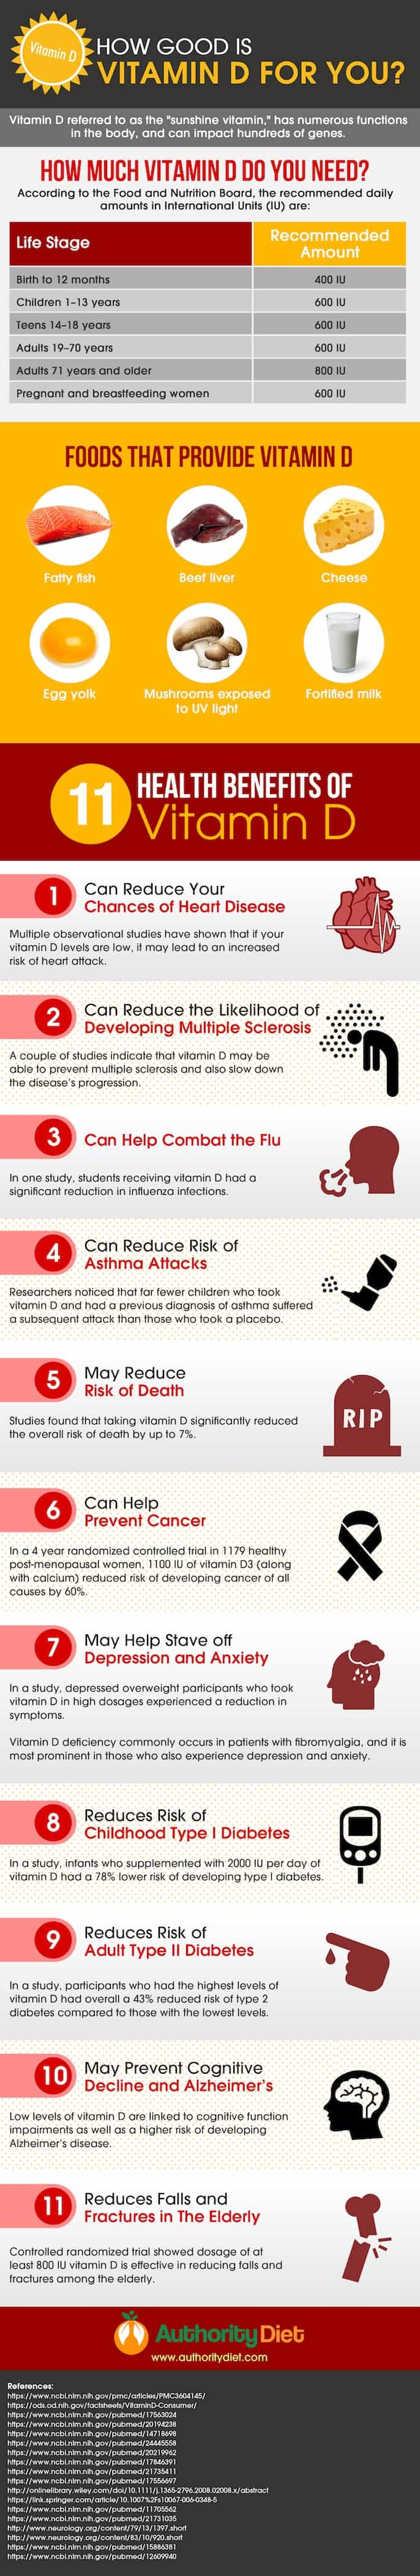 Vitamin D benefits infographic